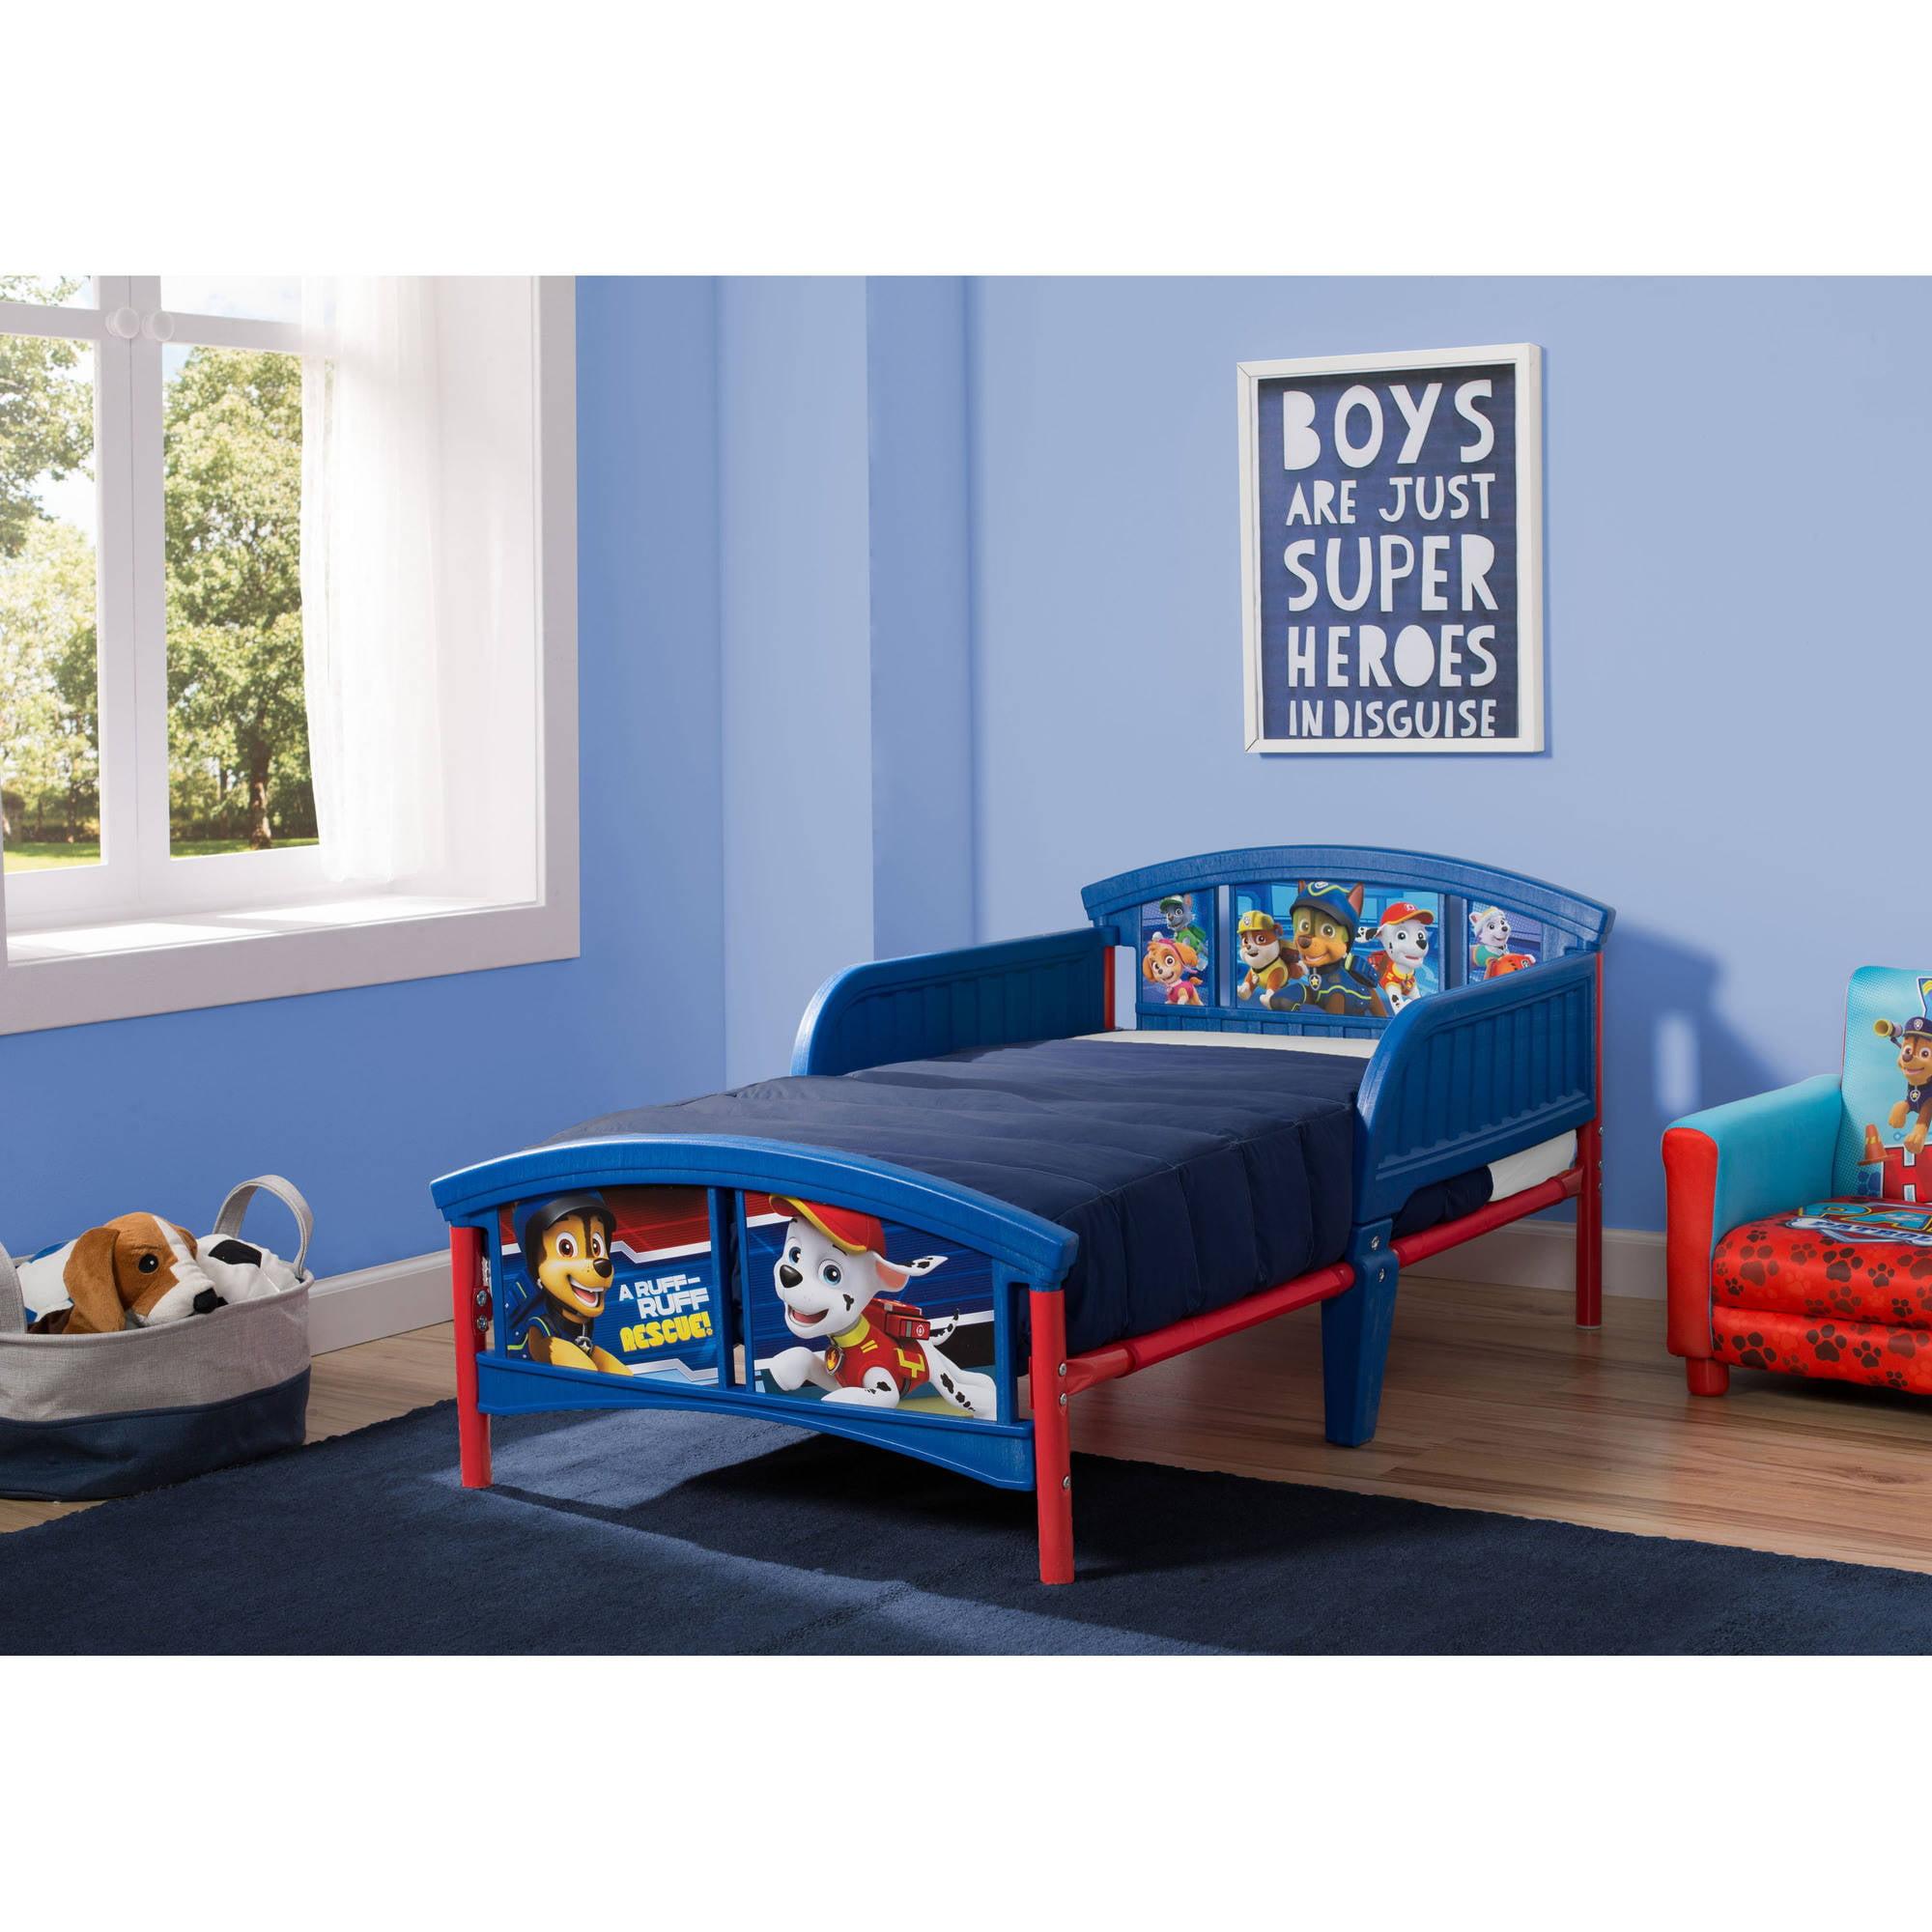 Nick Jr. PAW Patrol Plastic Toddler Bed - Delta Children